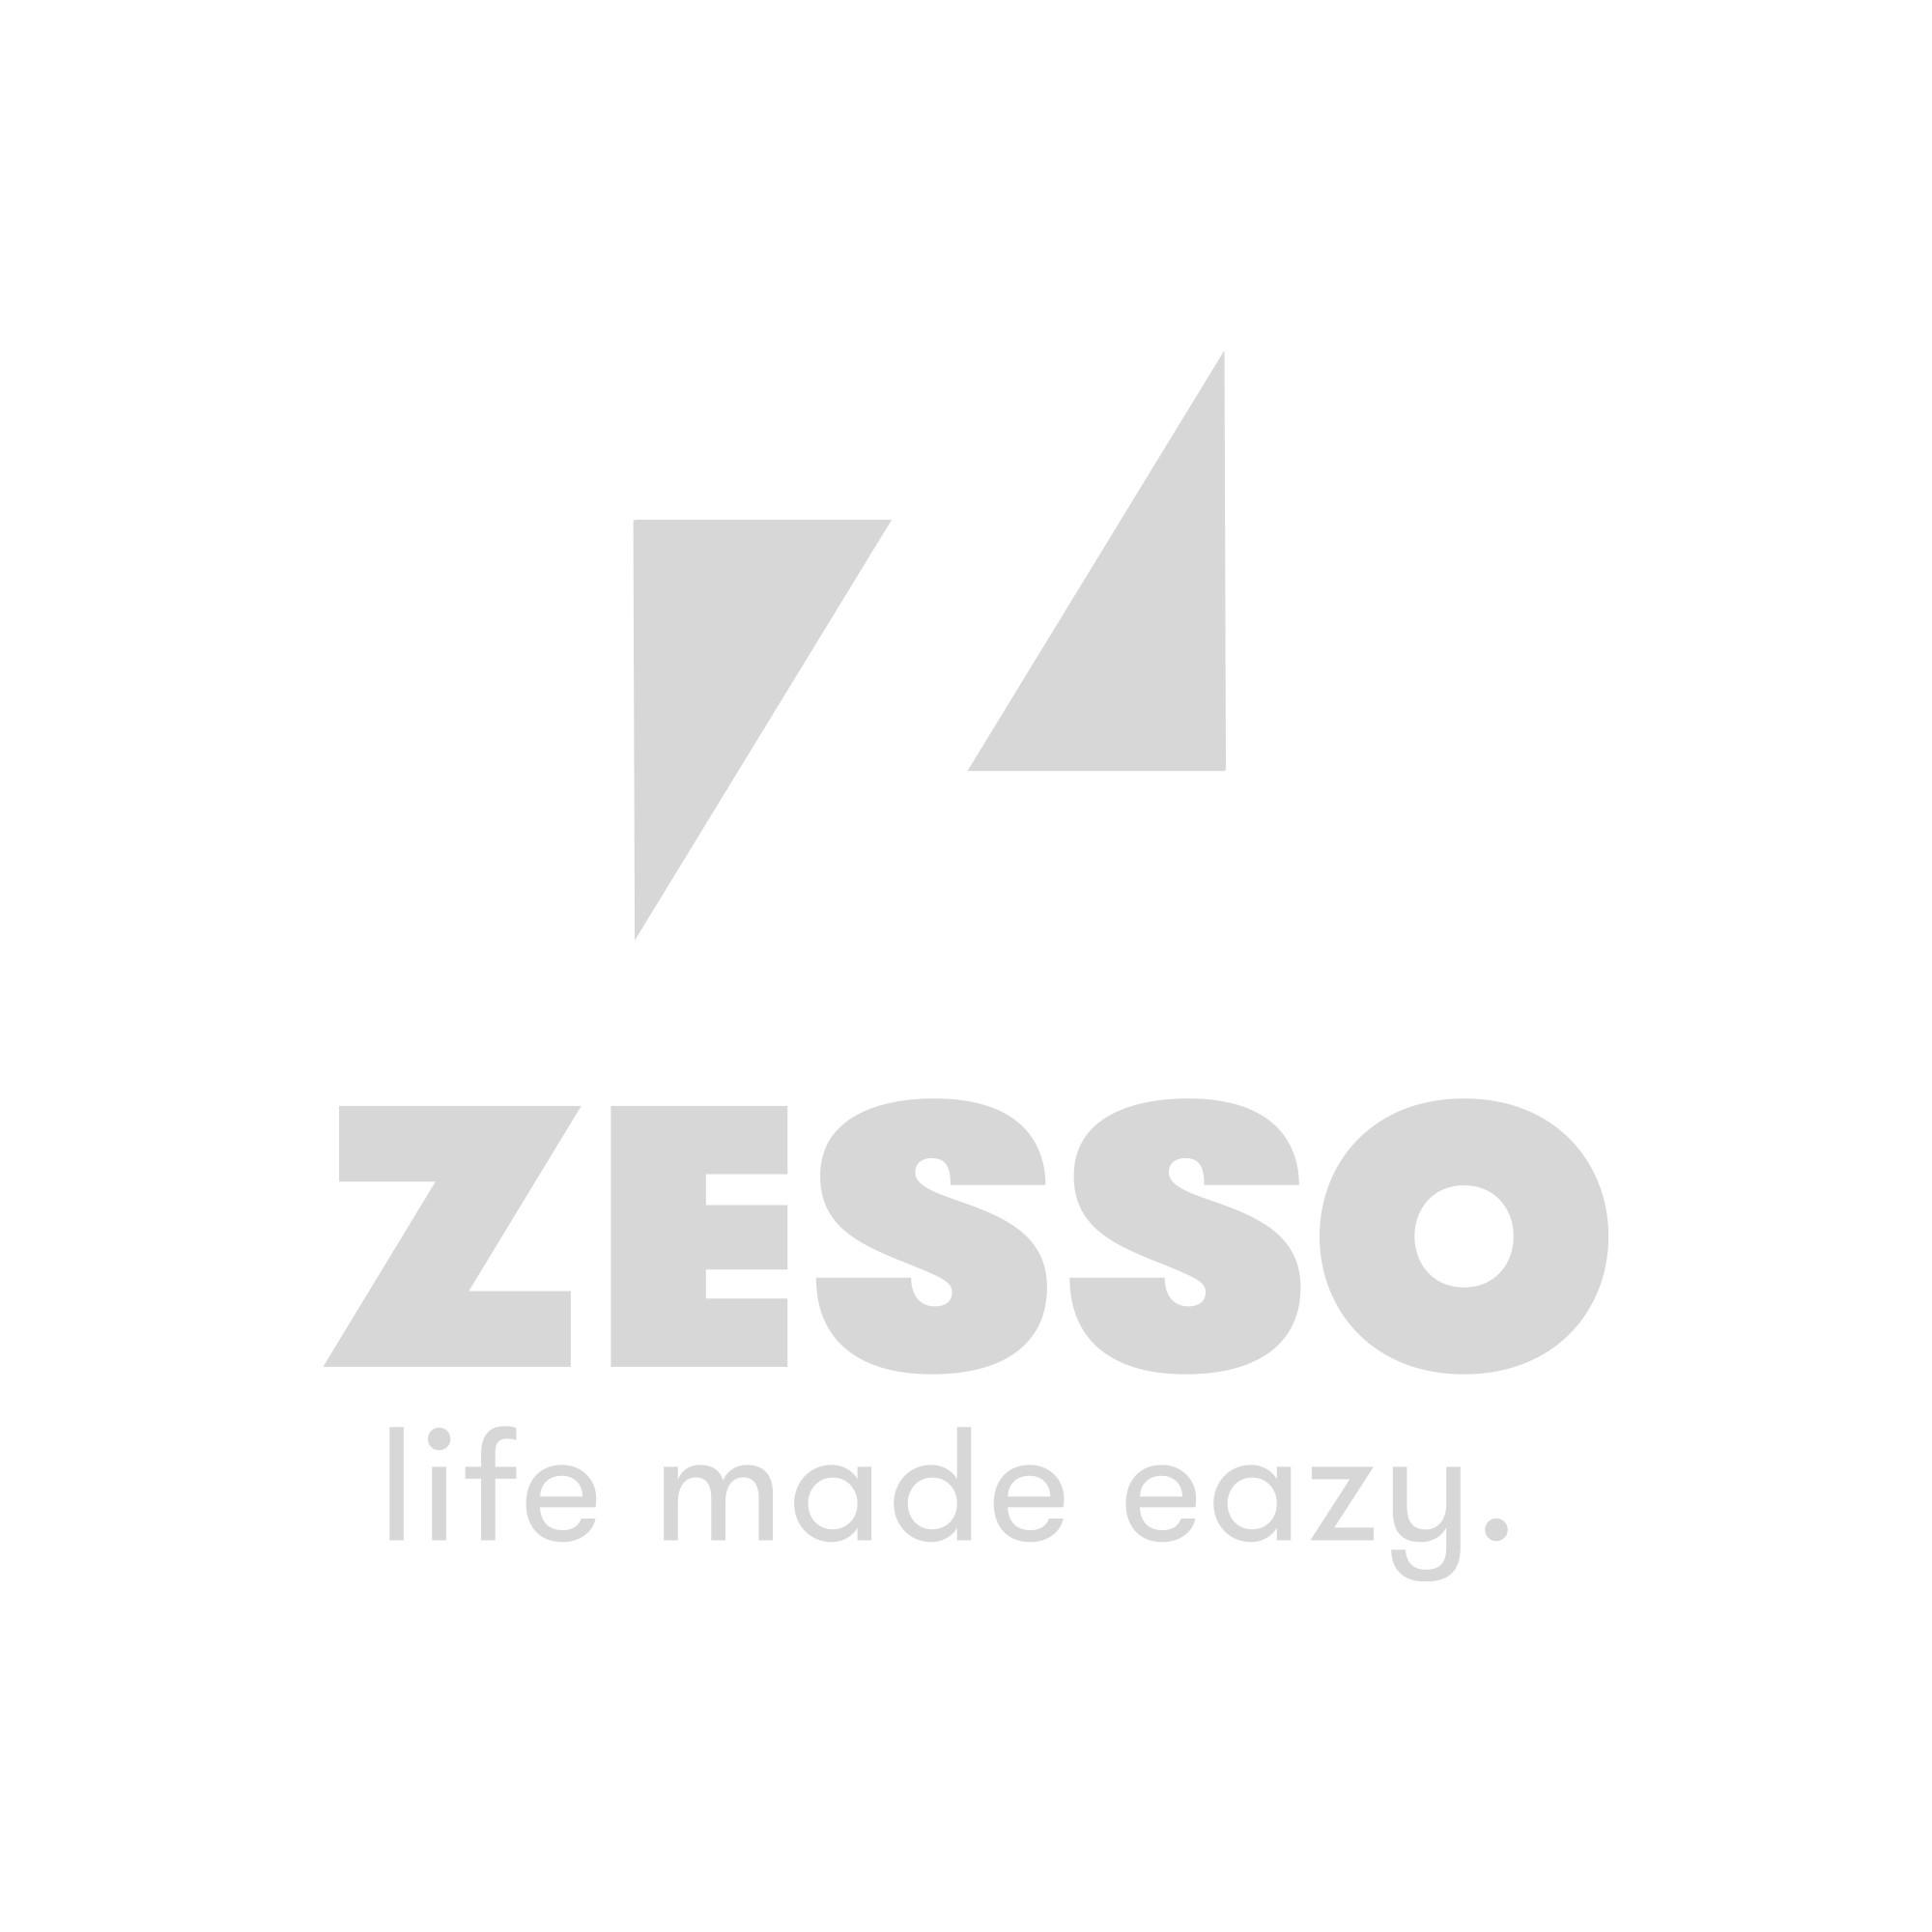 Bialetti Espresso Maker Moka Express Zwart 6 Kops